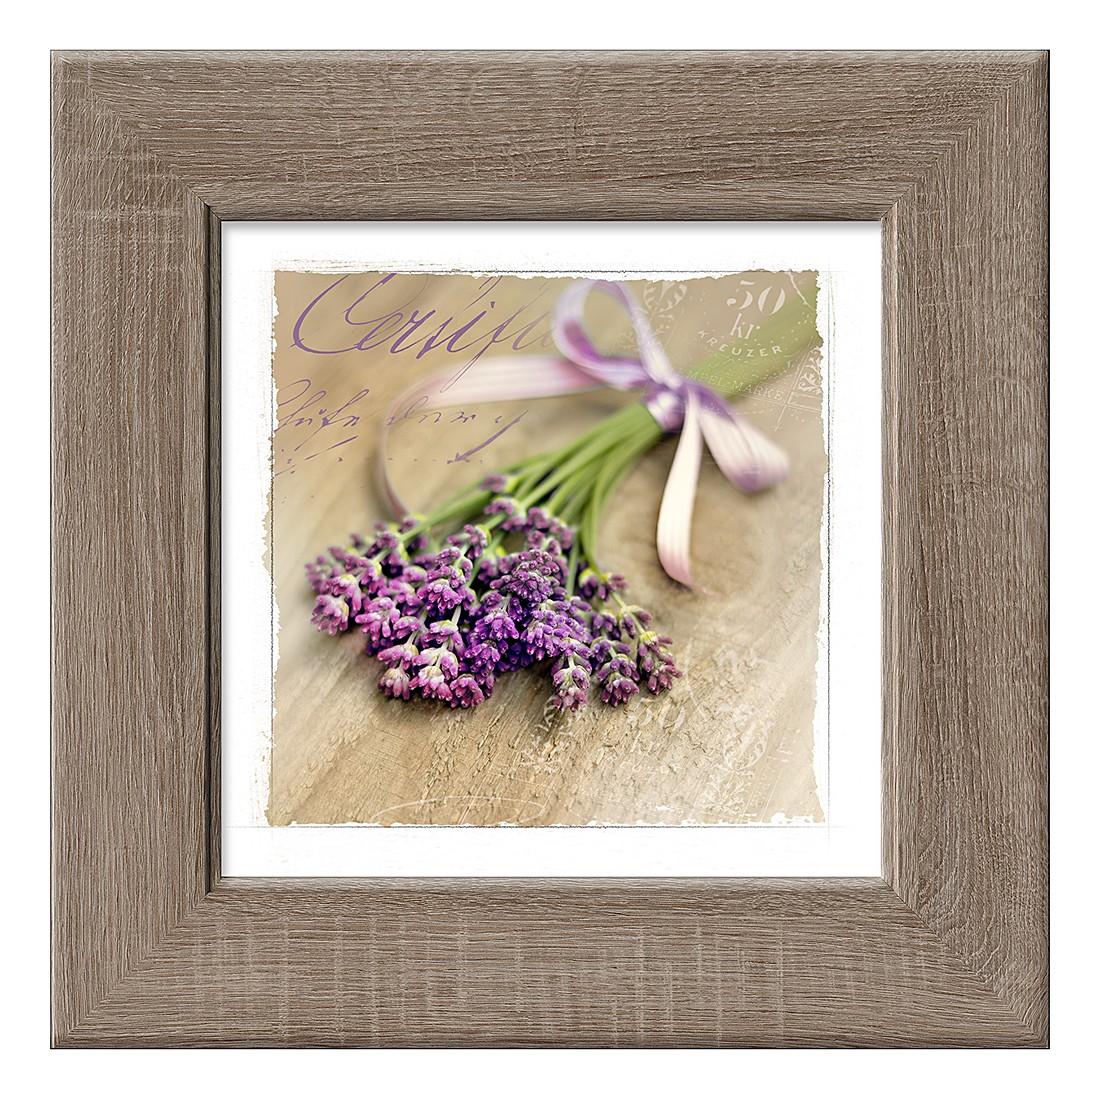 Kunstdruck Lovely lavender II, Pro Art günstig